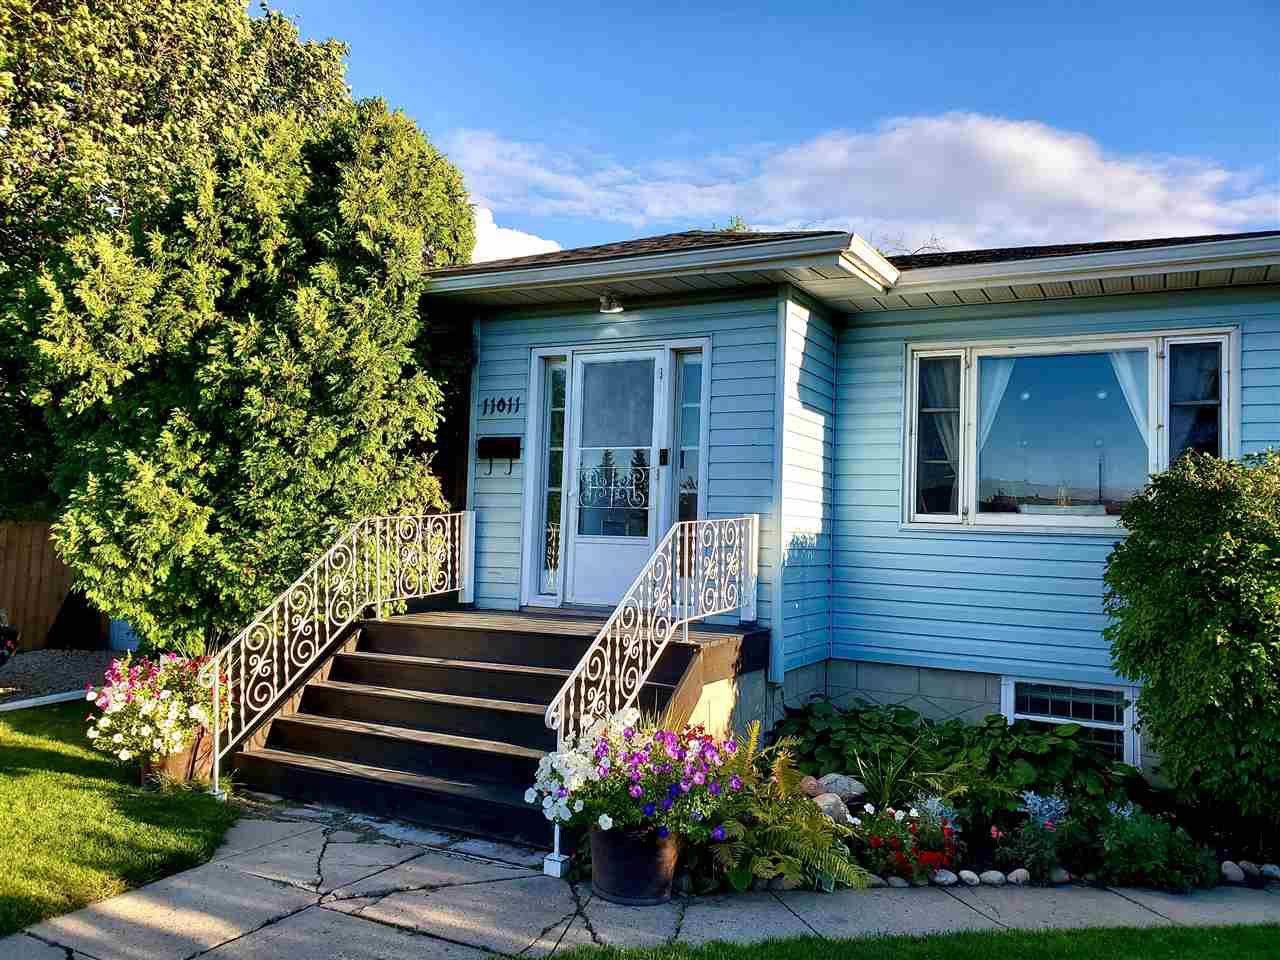 Main Photo: 11011 111 Avenue in Edmonton: Zone 08 House for sale : MLS®# E4222728